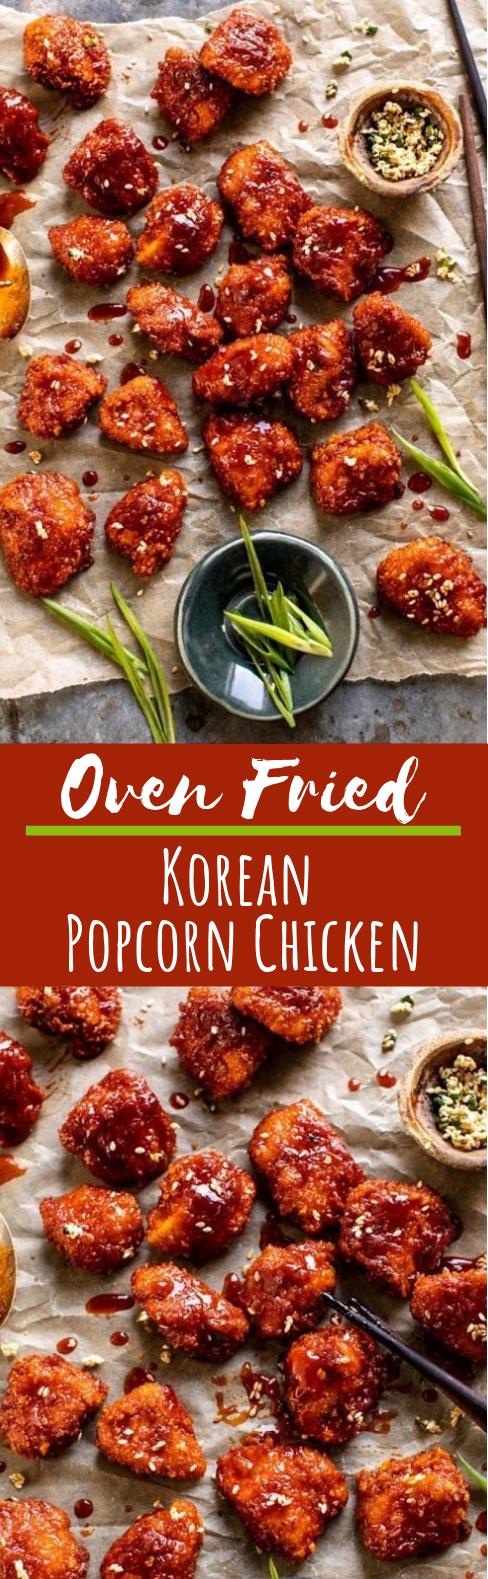 Oven Fried Korean Popcorn Chicken #chicken #appetizers